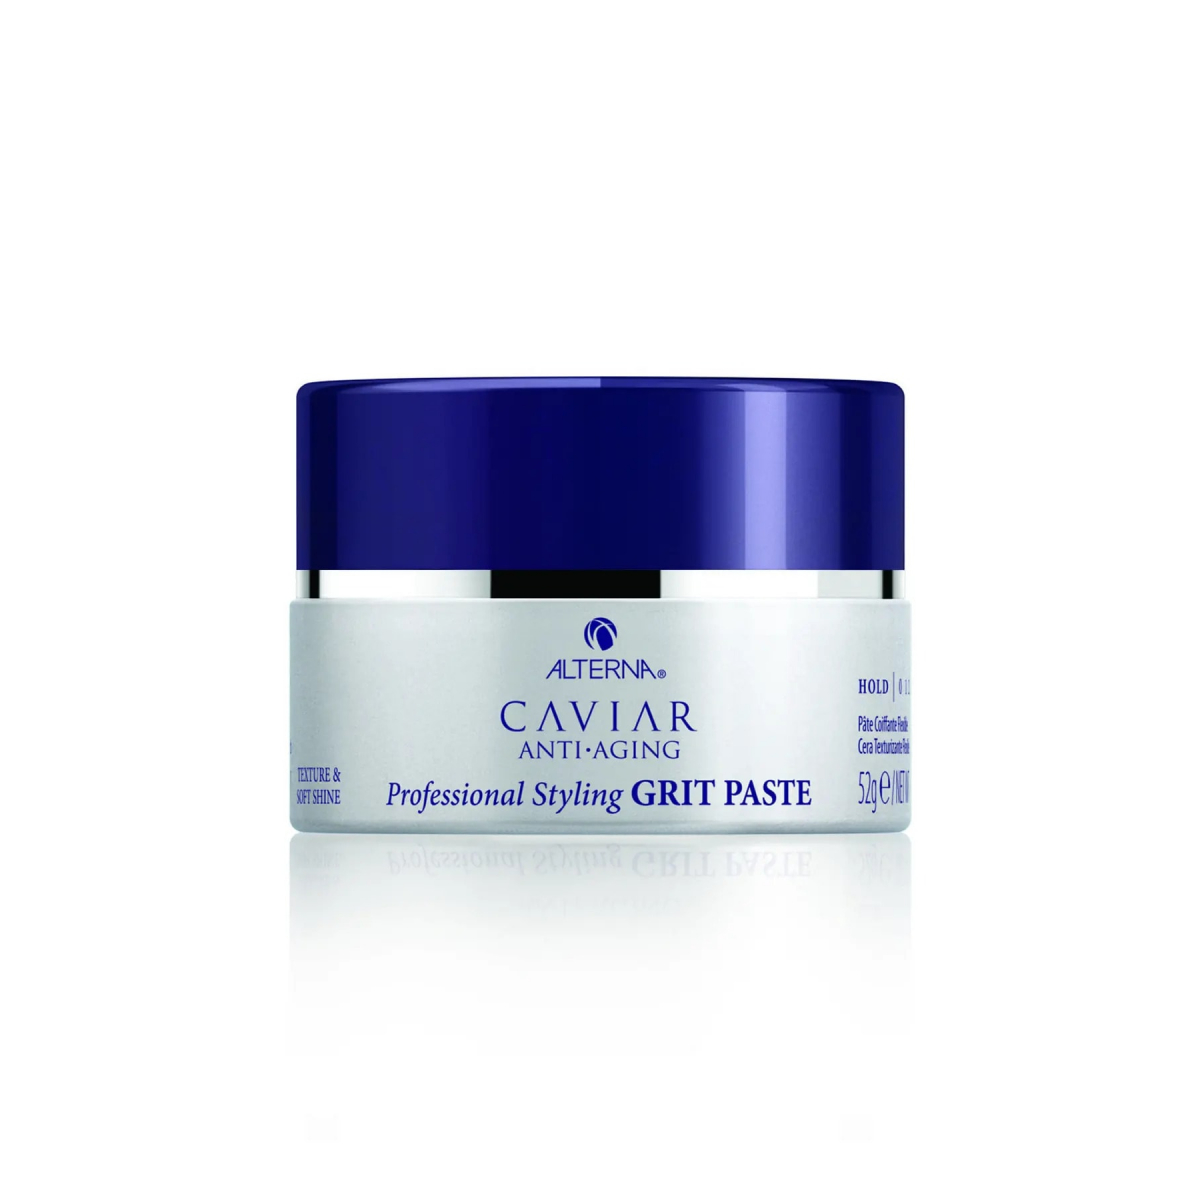 ALTERNA Caviar Profesyonel Saç Şekillendirici Macun 50 g